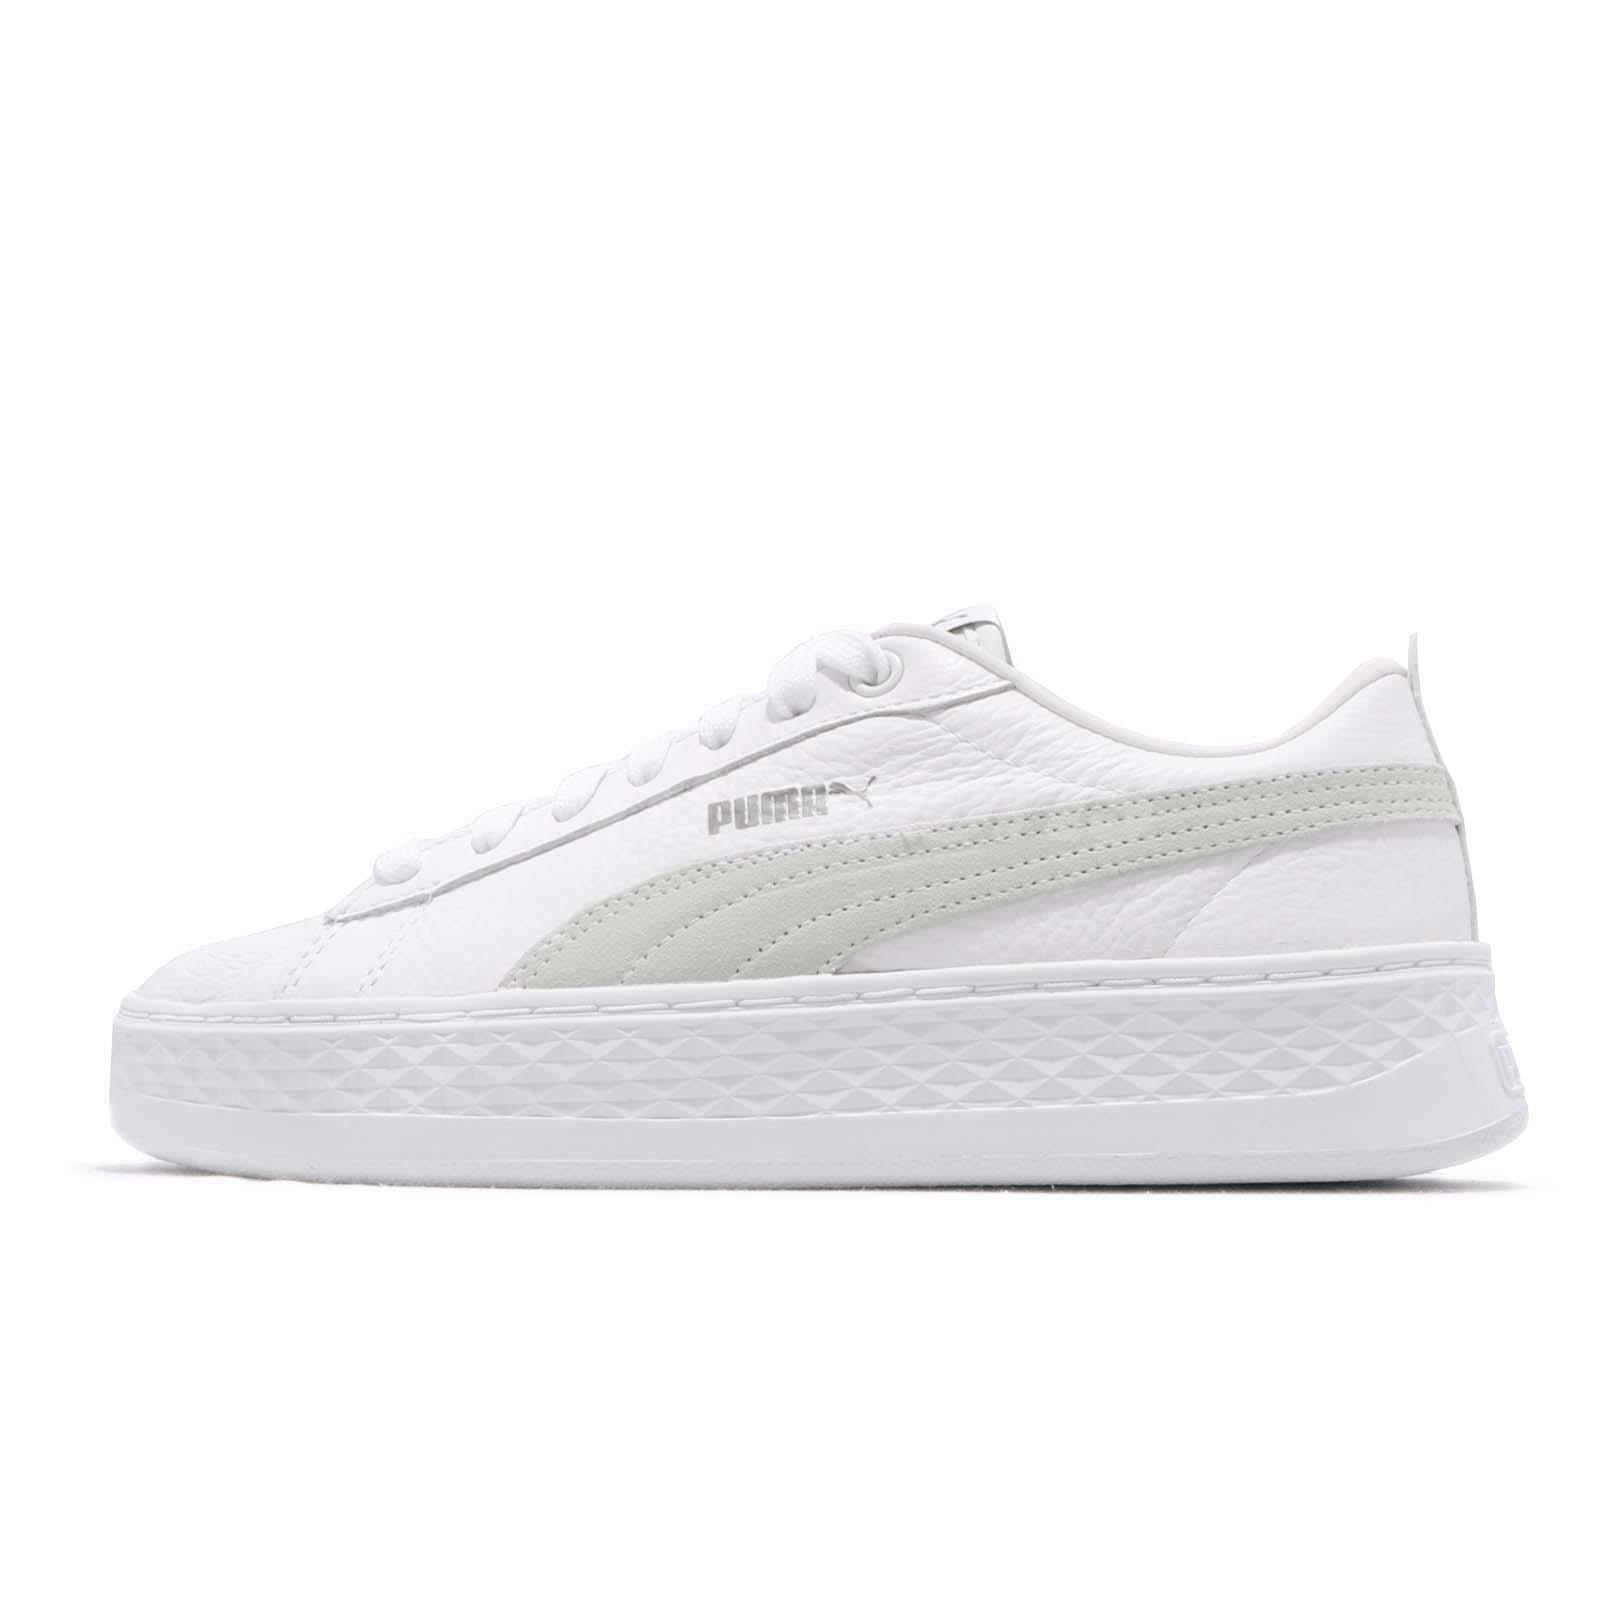 f1b68ab5a4e7 Puma Smash Platform L White Women Lifestyle Casual Shoes Sneakers 366487-06